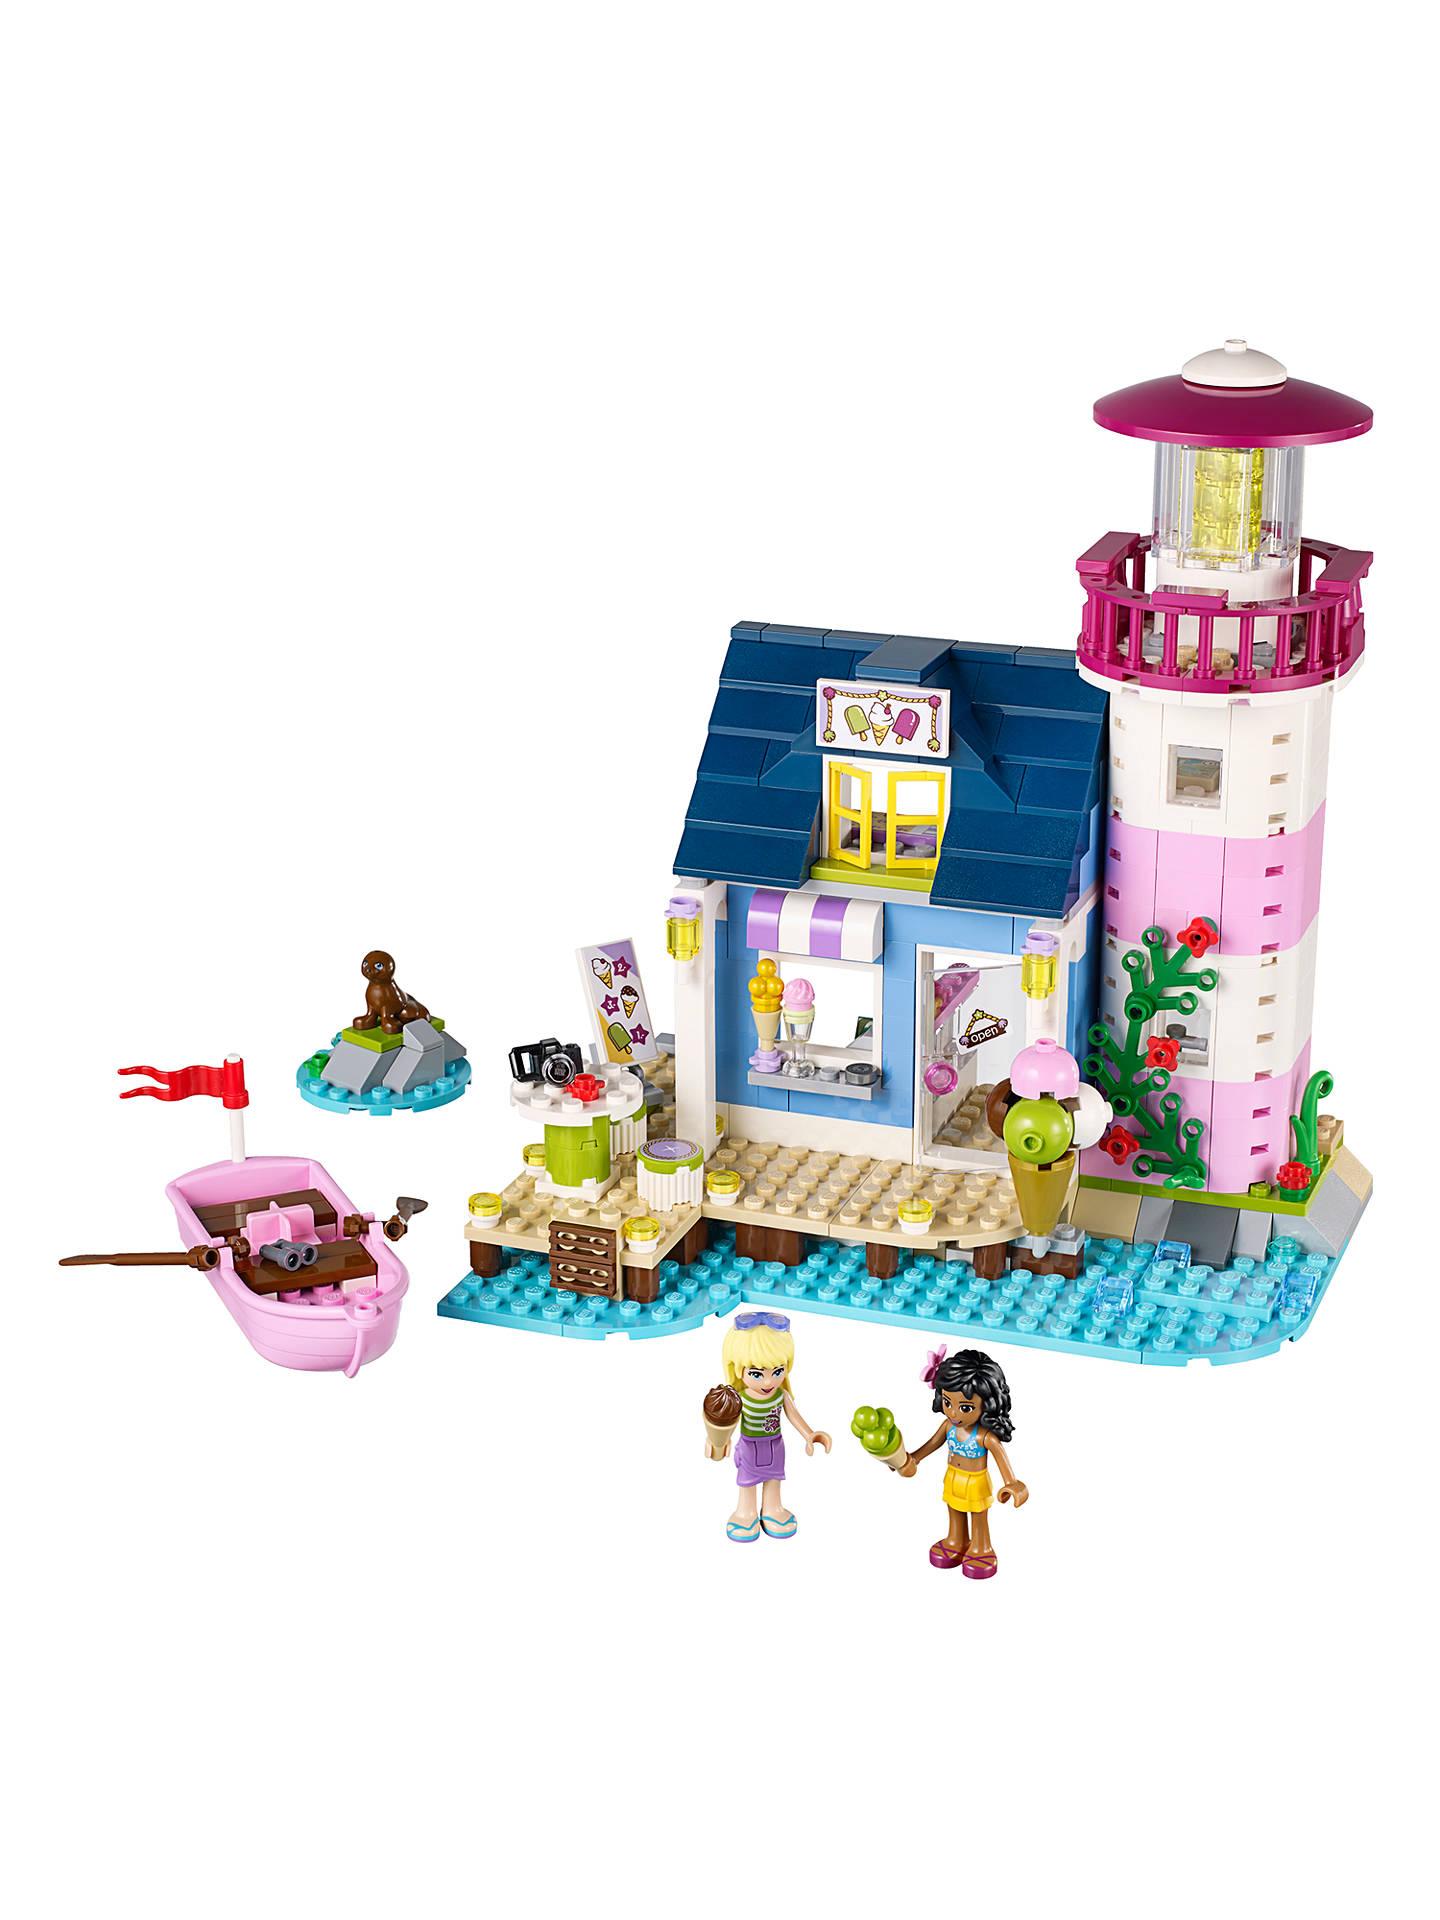 LEGO Friends 41094 Heartlake Lighthouse at John Lewis ...